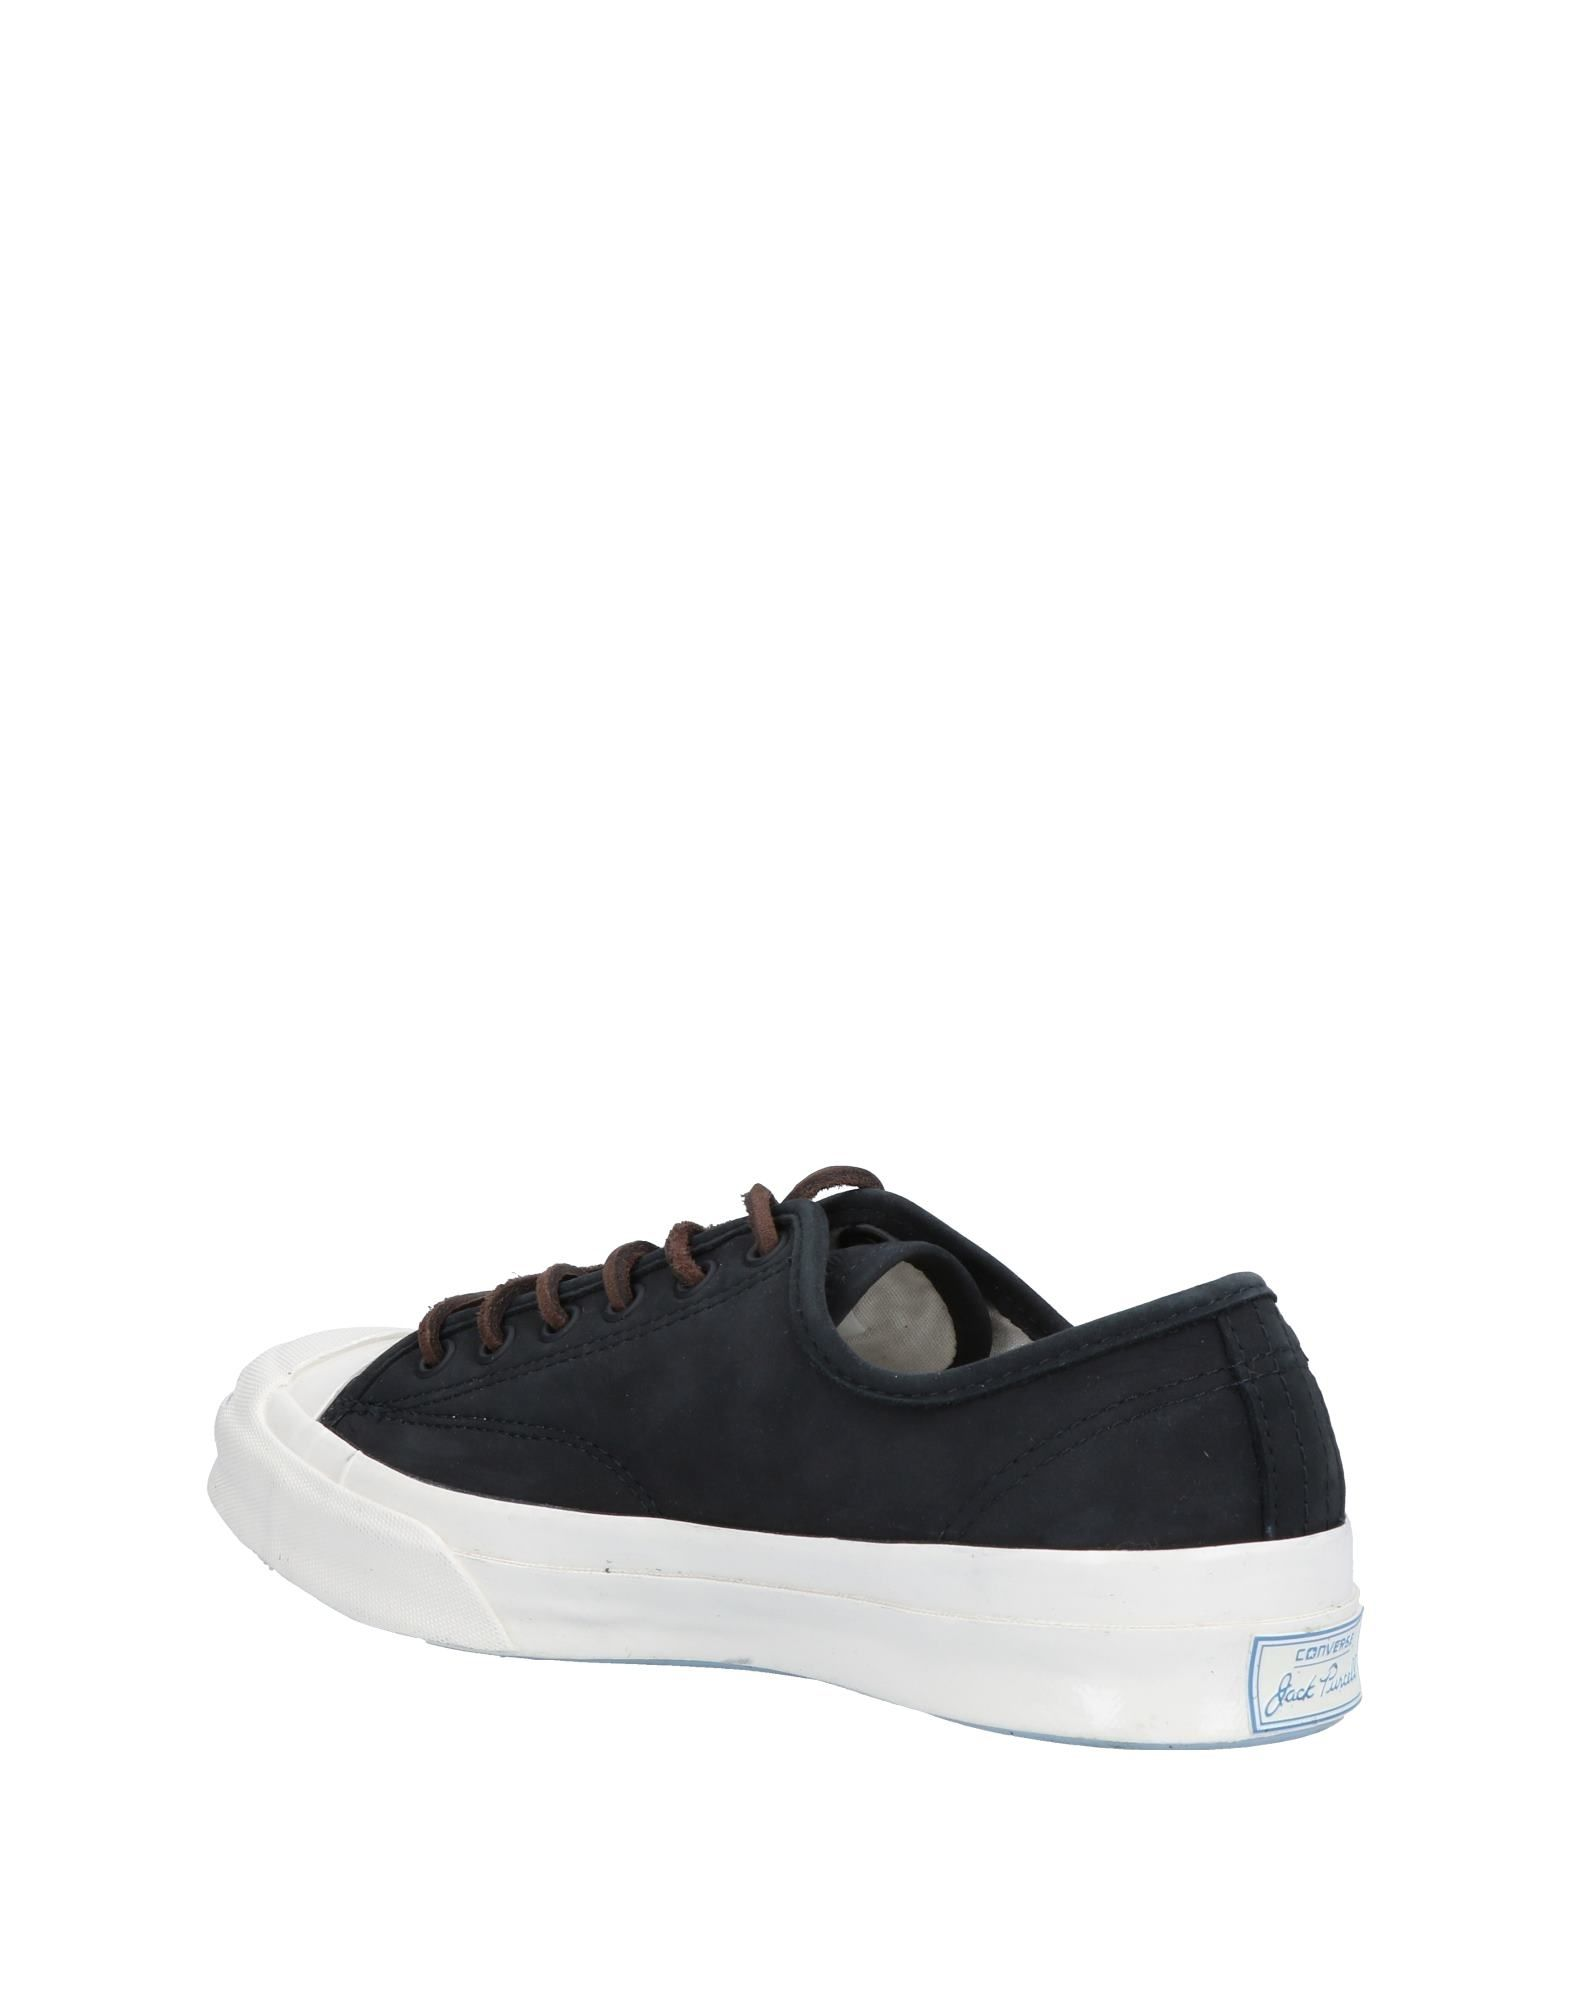 Converse Jack Purcell Sneakers Neue Damen  11471206DD Neue Sneakers Schuhe 8a717a